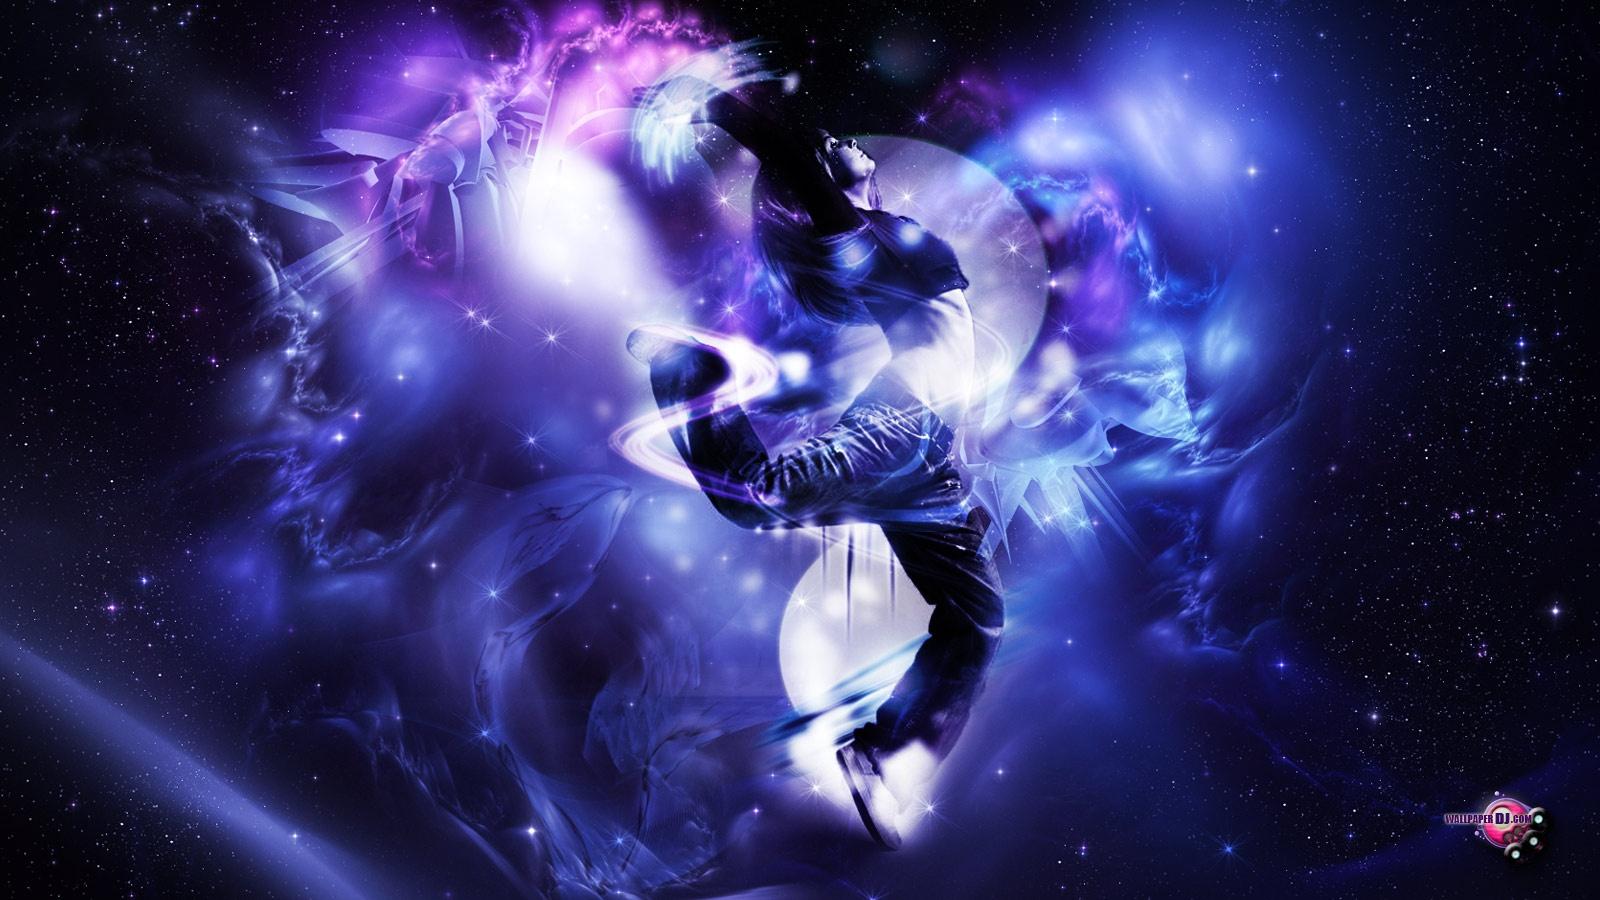 3d Girl Dance Hd Wallpapers: HD Dance Wallpapers